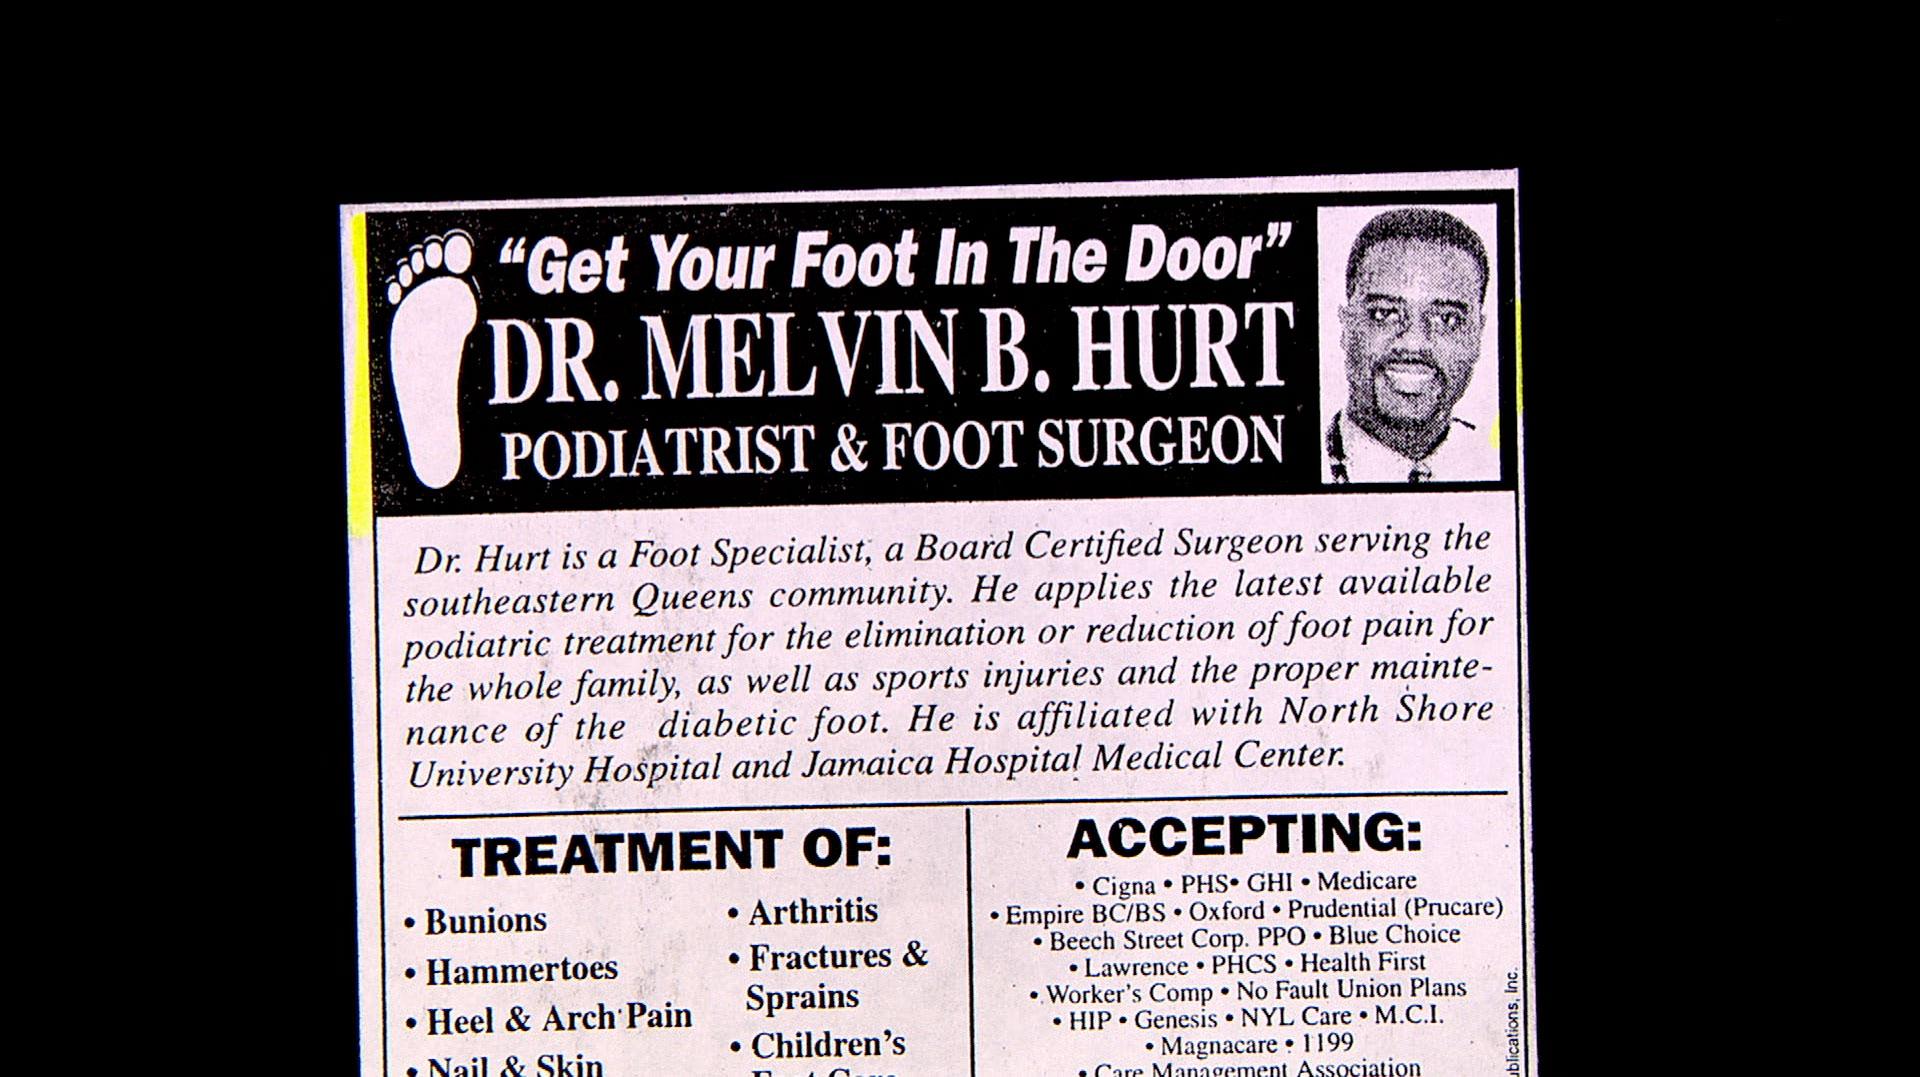 Dr. Melvin B. Hurt